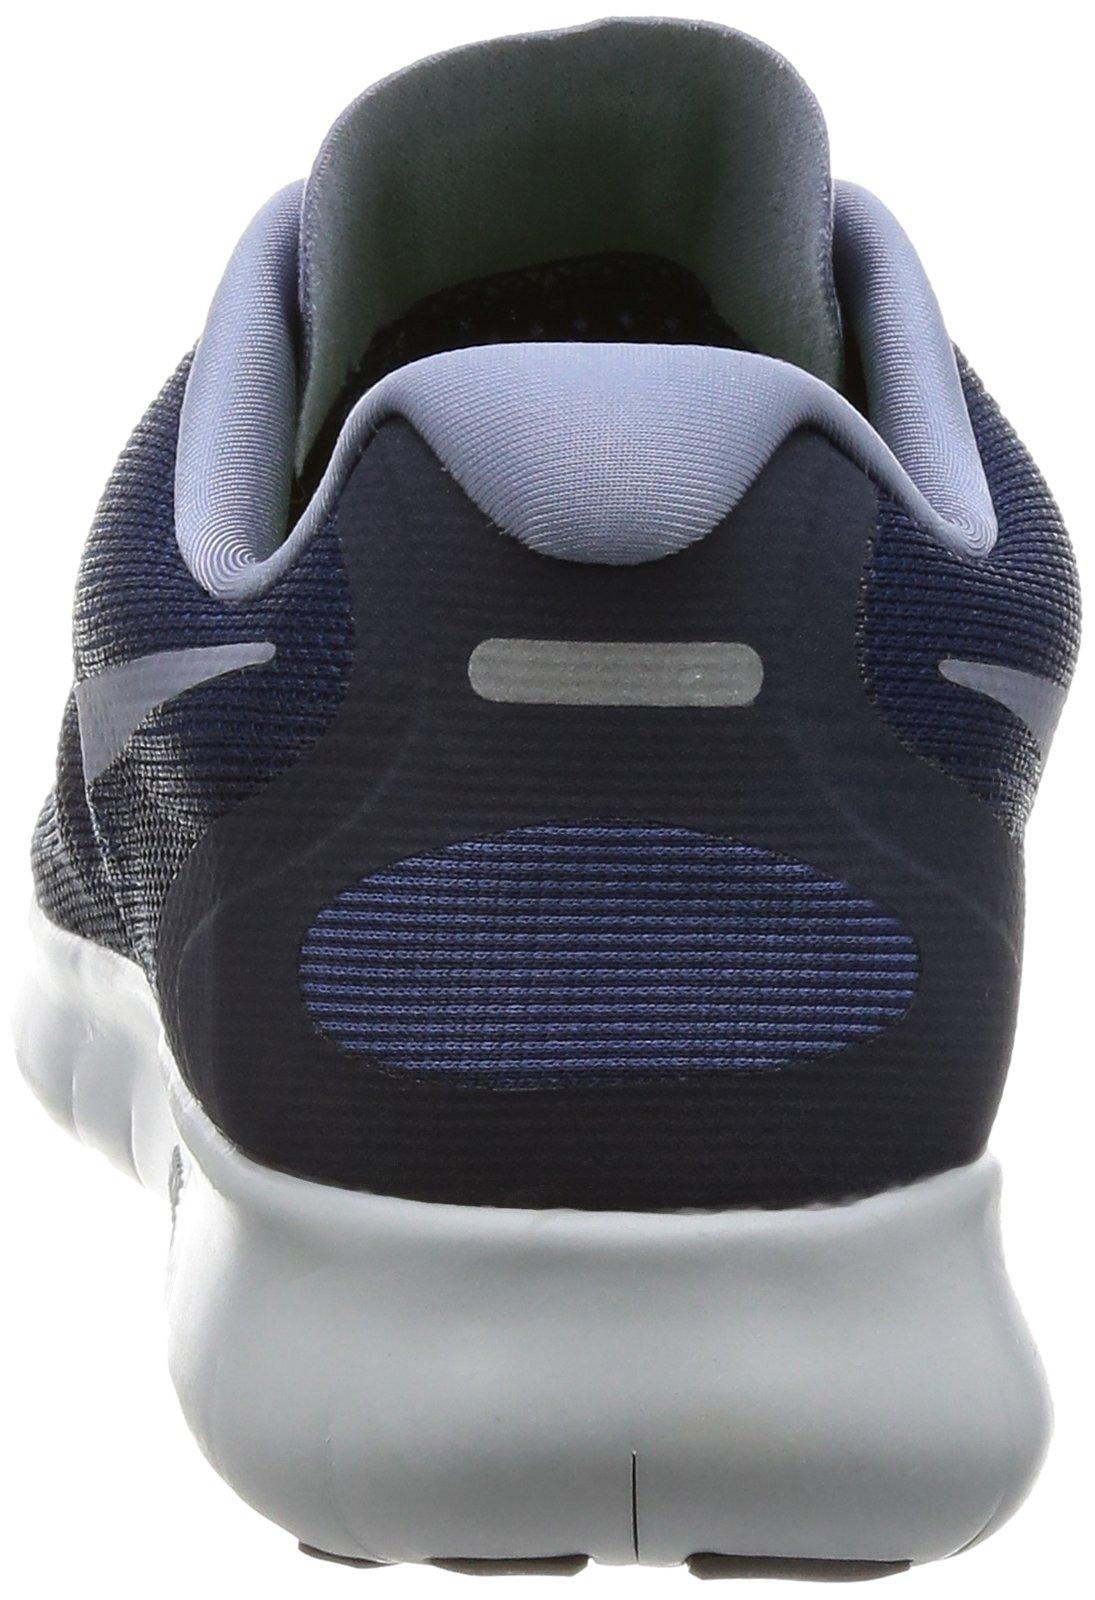 Nike Free RN 2017 Women's Running Shoes (6 M US, Binary Blue/Dark Sky Blue) by Nike (Image #2)